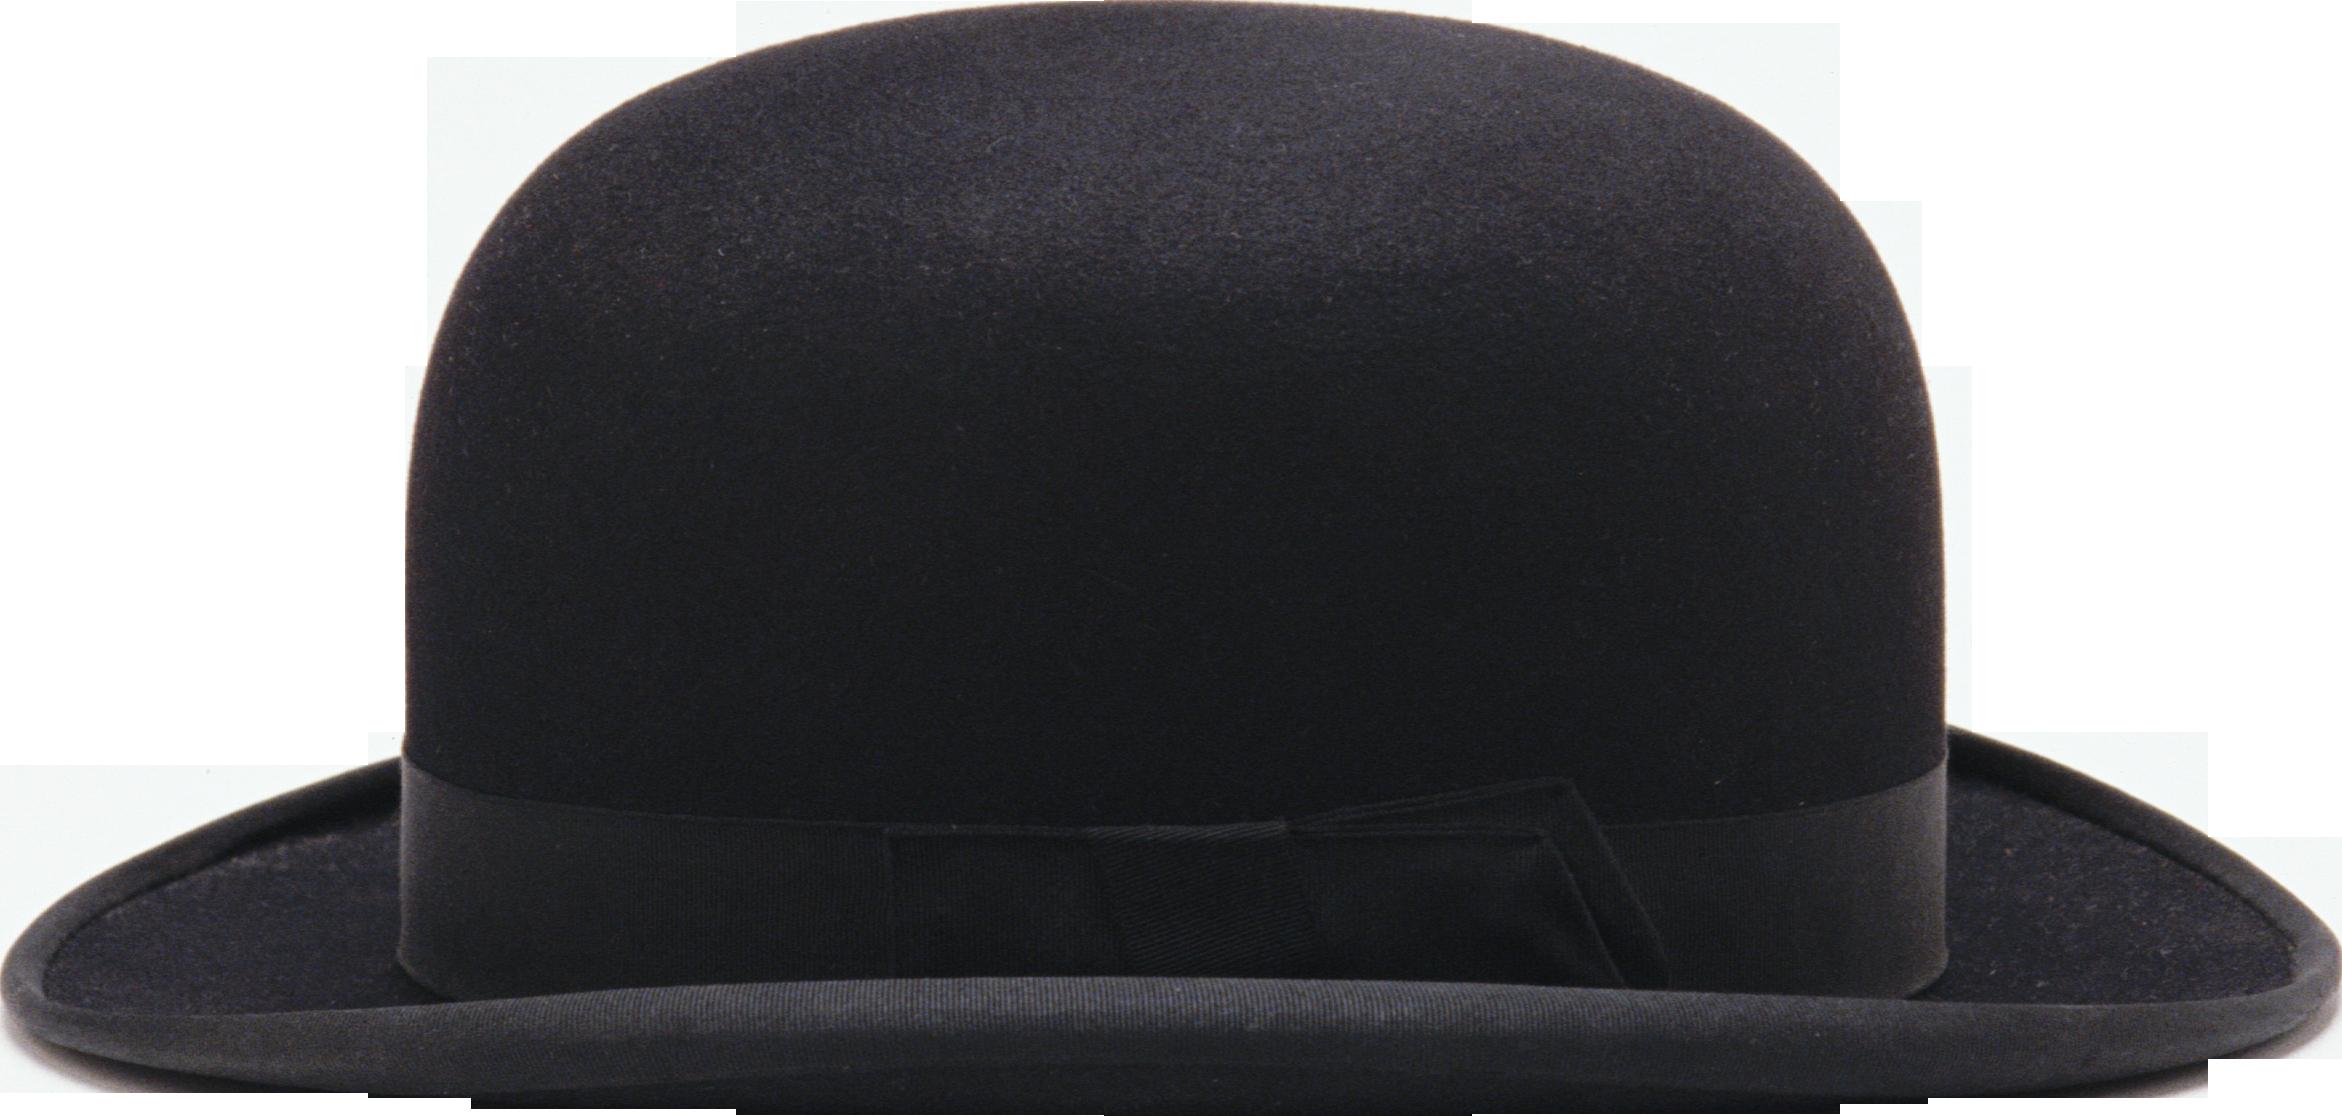 Hat PNG image - Cap PNG